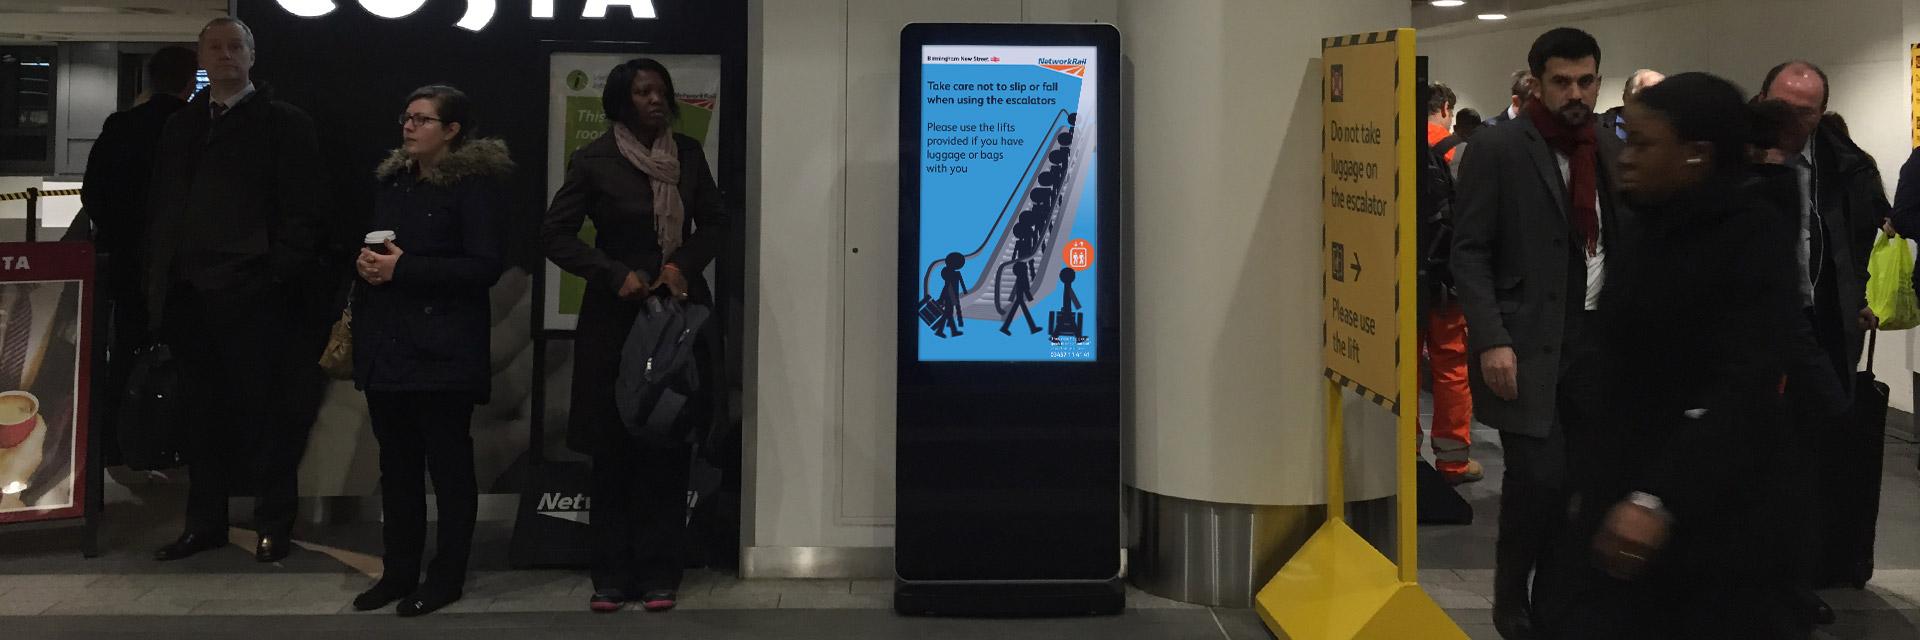 Freestanding Totem Network Rail